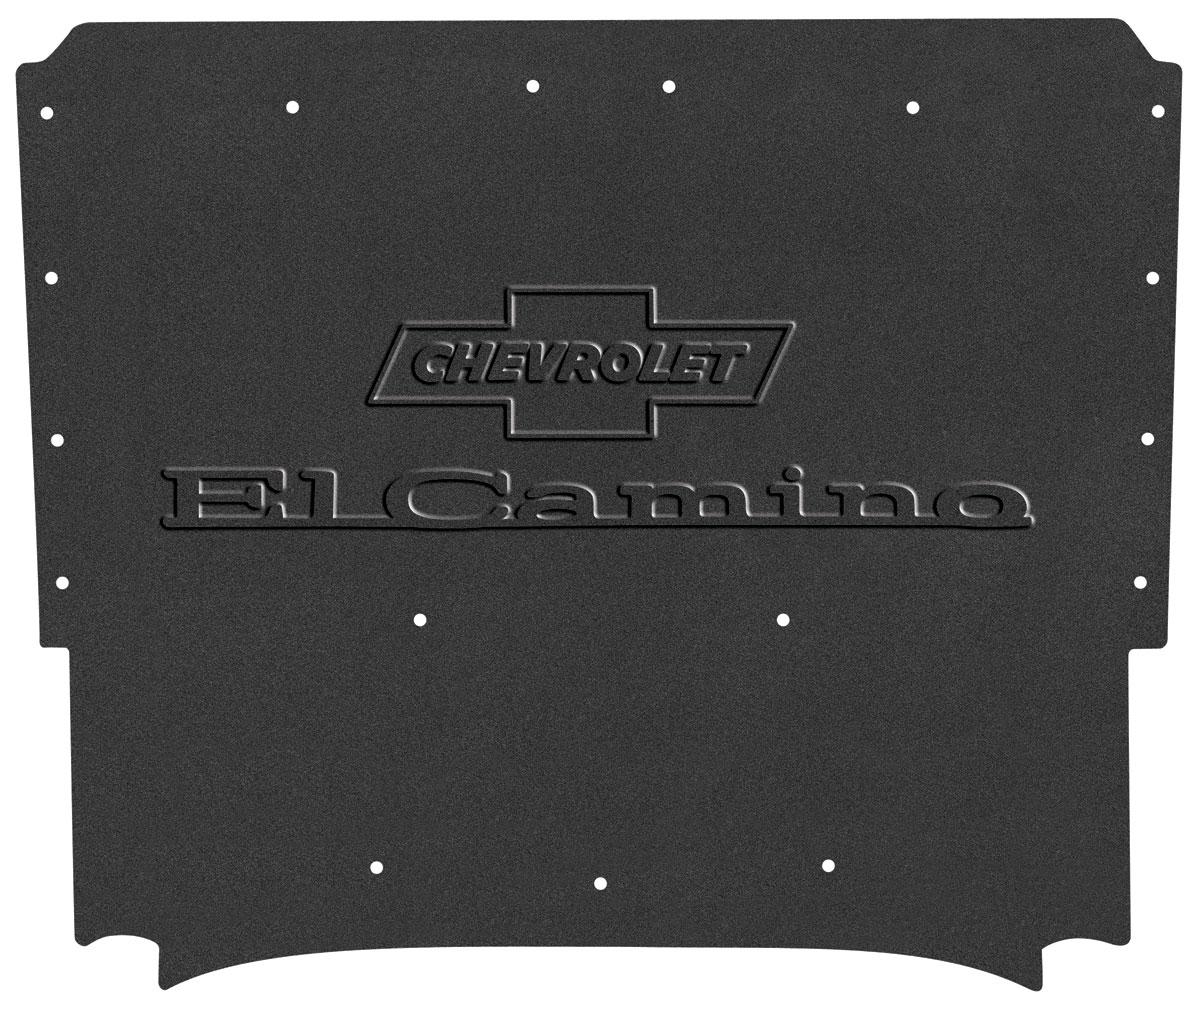 "Photo of Hood Insulation & Shield Kit; AcoustiHood ""el Camino"" Logo"